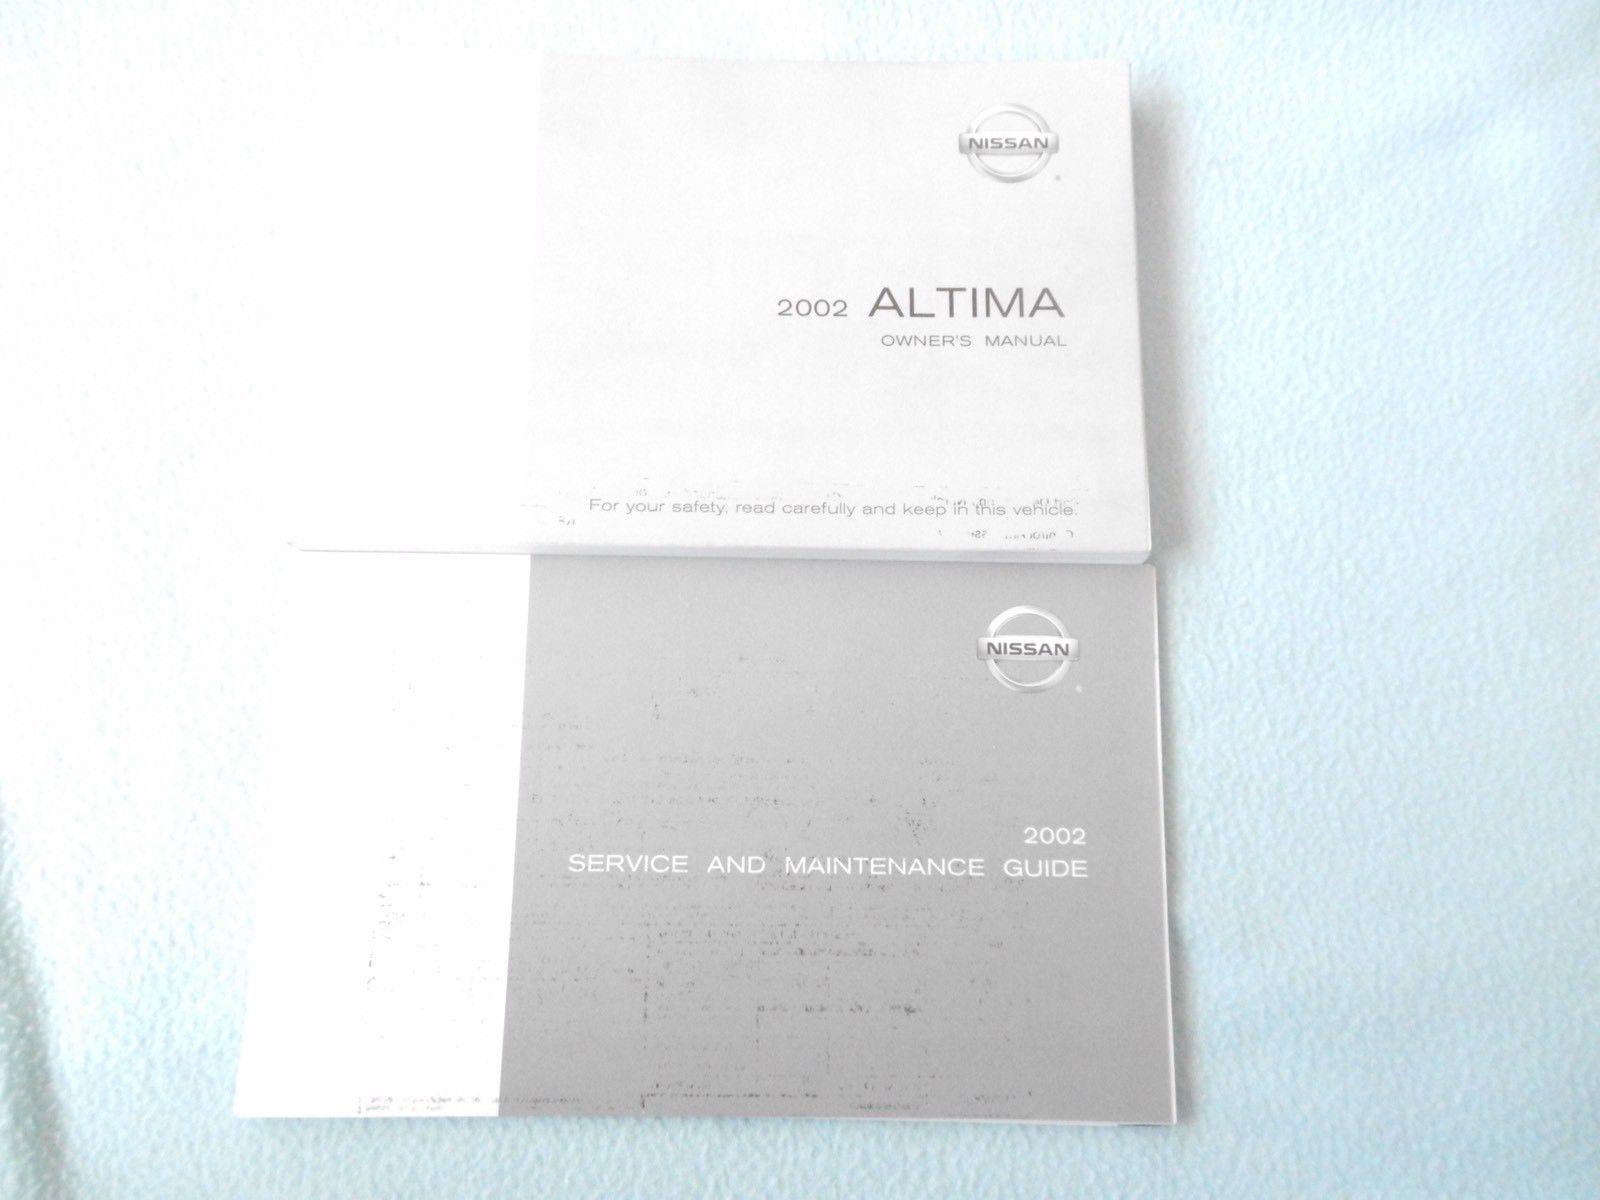 2002 nissan altima owners manual with binder and 50 similar items rh bonanzamarket co uk Nissan Altima Manual PDF 2005 Nissan Altima Manual Book